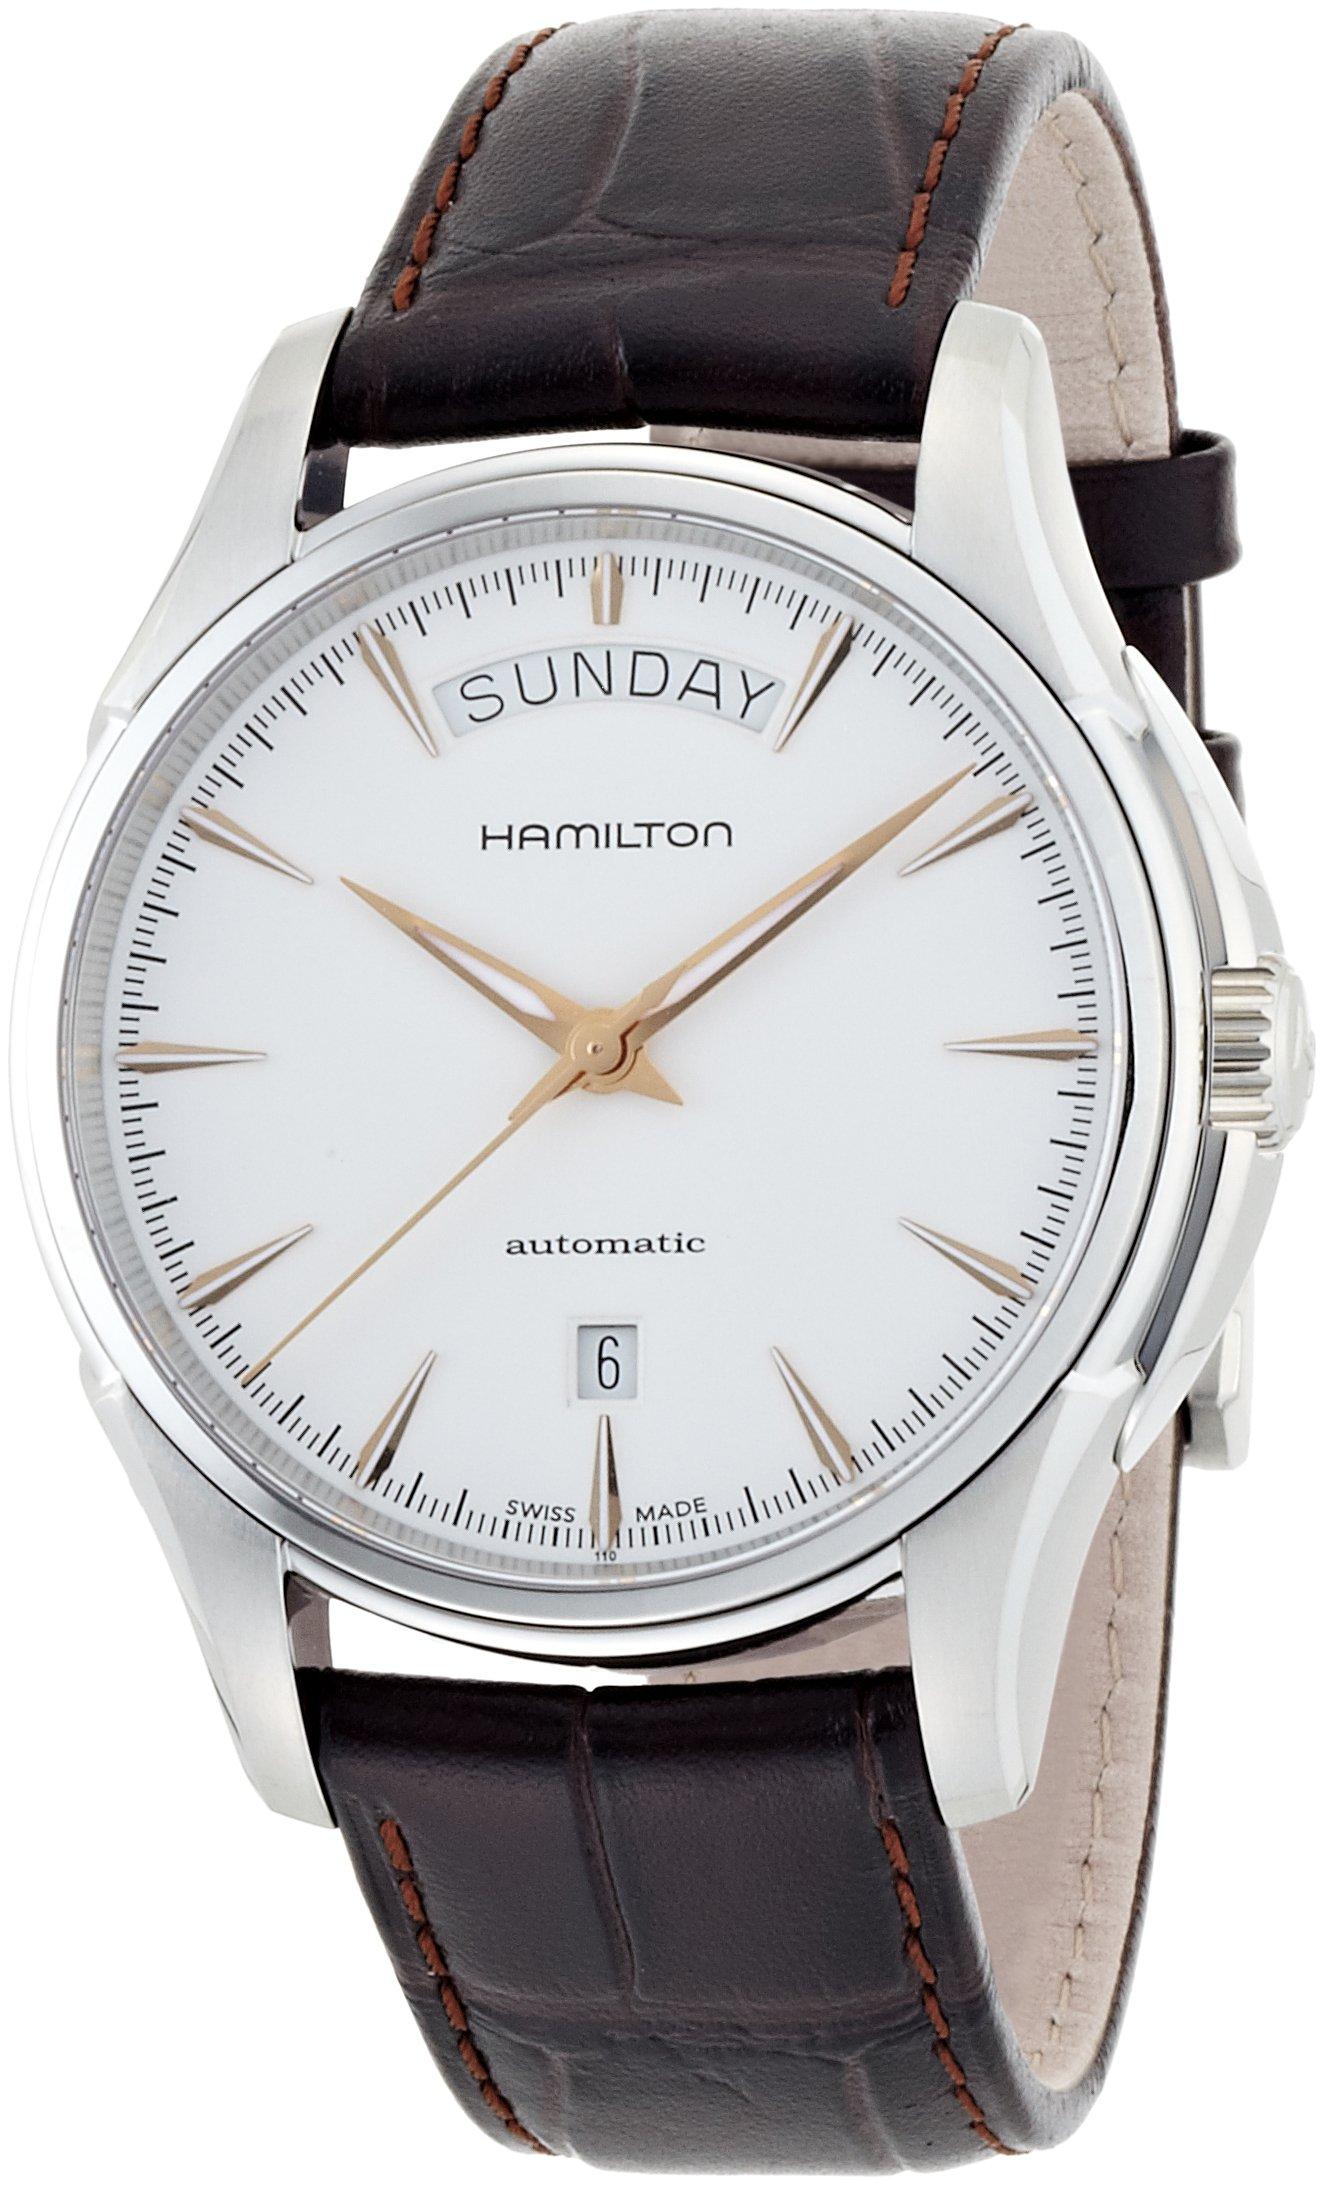 Hamilton – Men's Watch H32505511